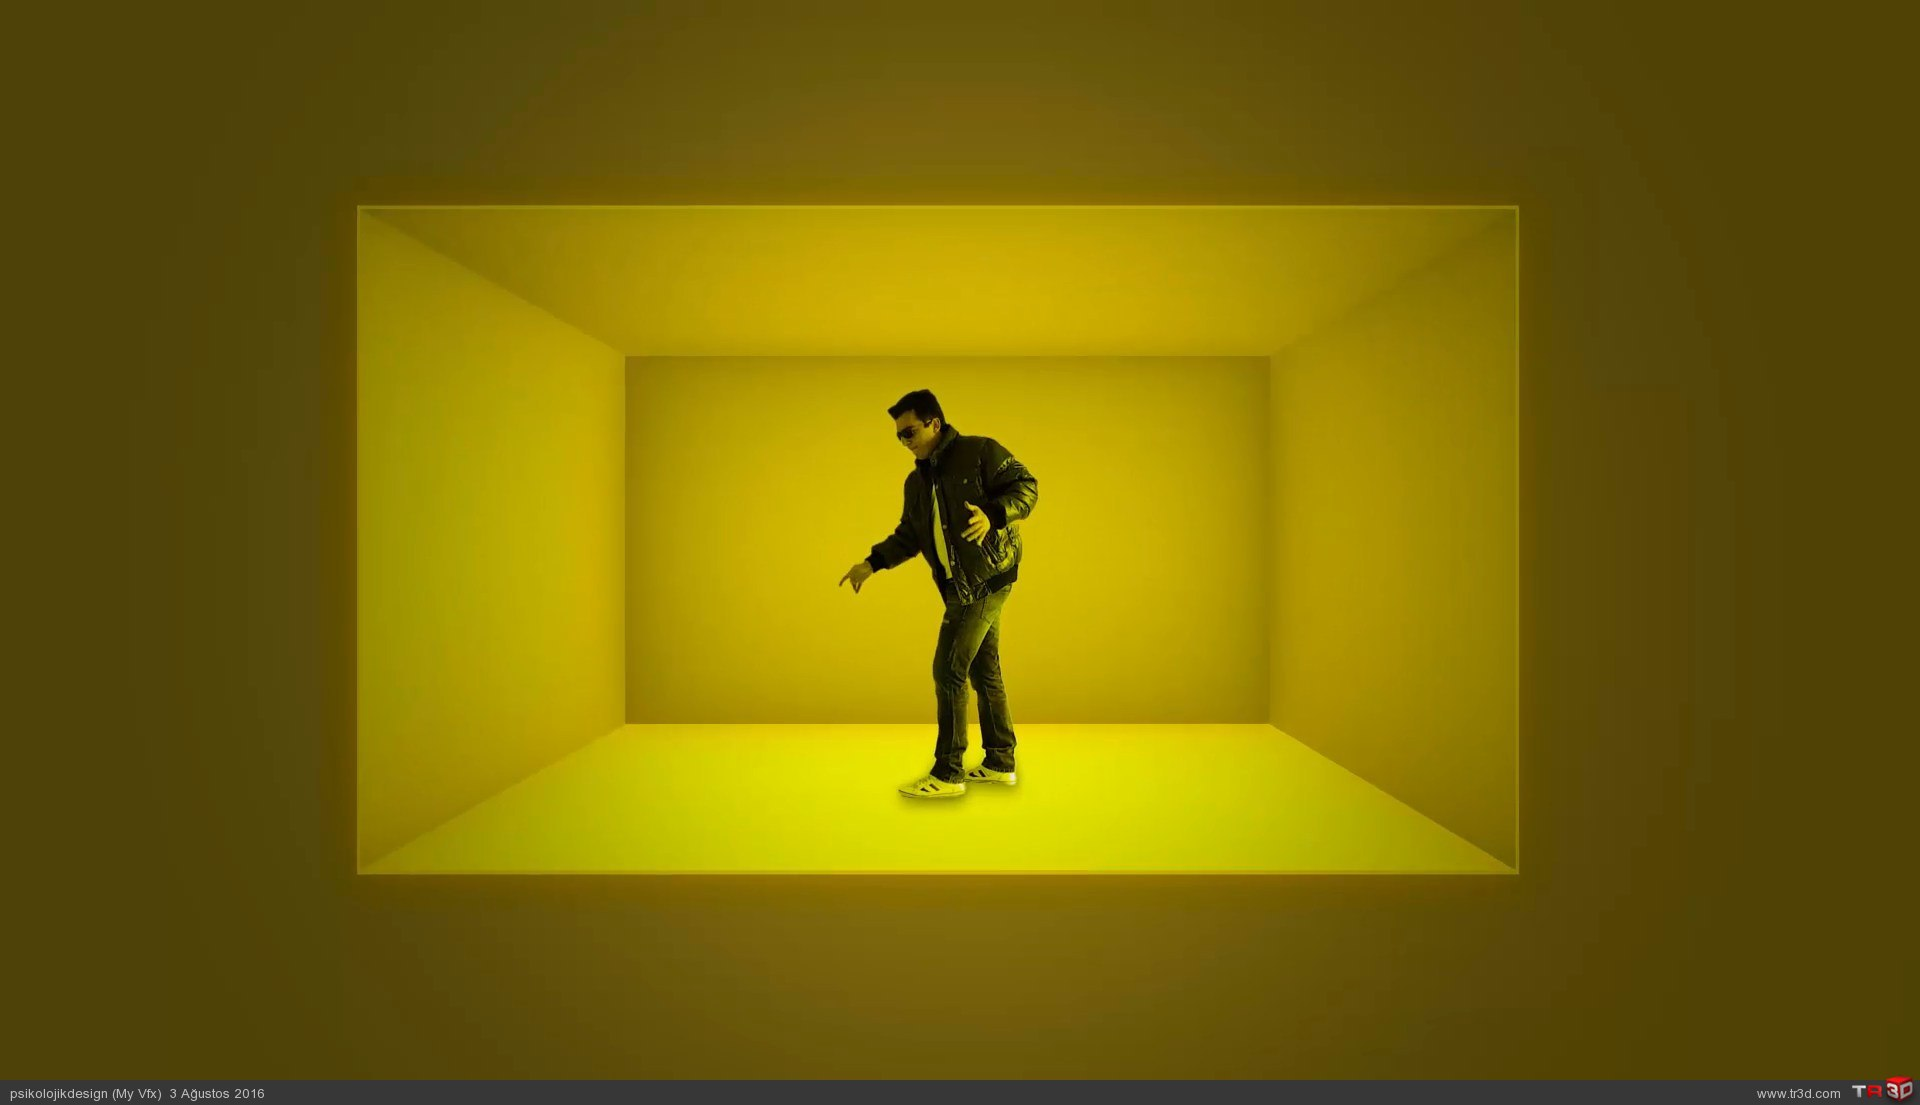 Drake Hotline Bling & Myvfx Karşılaştırma   After Effects - Cinema 4d Klip Yapım Dersi  1